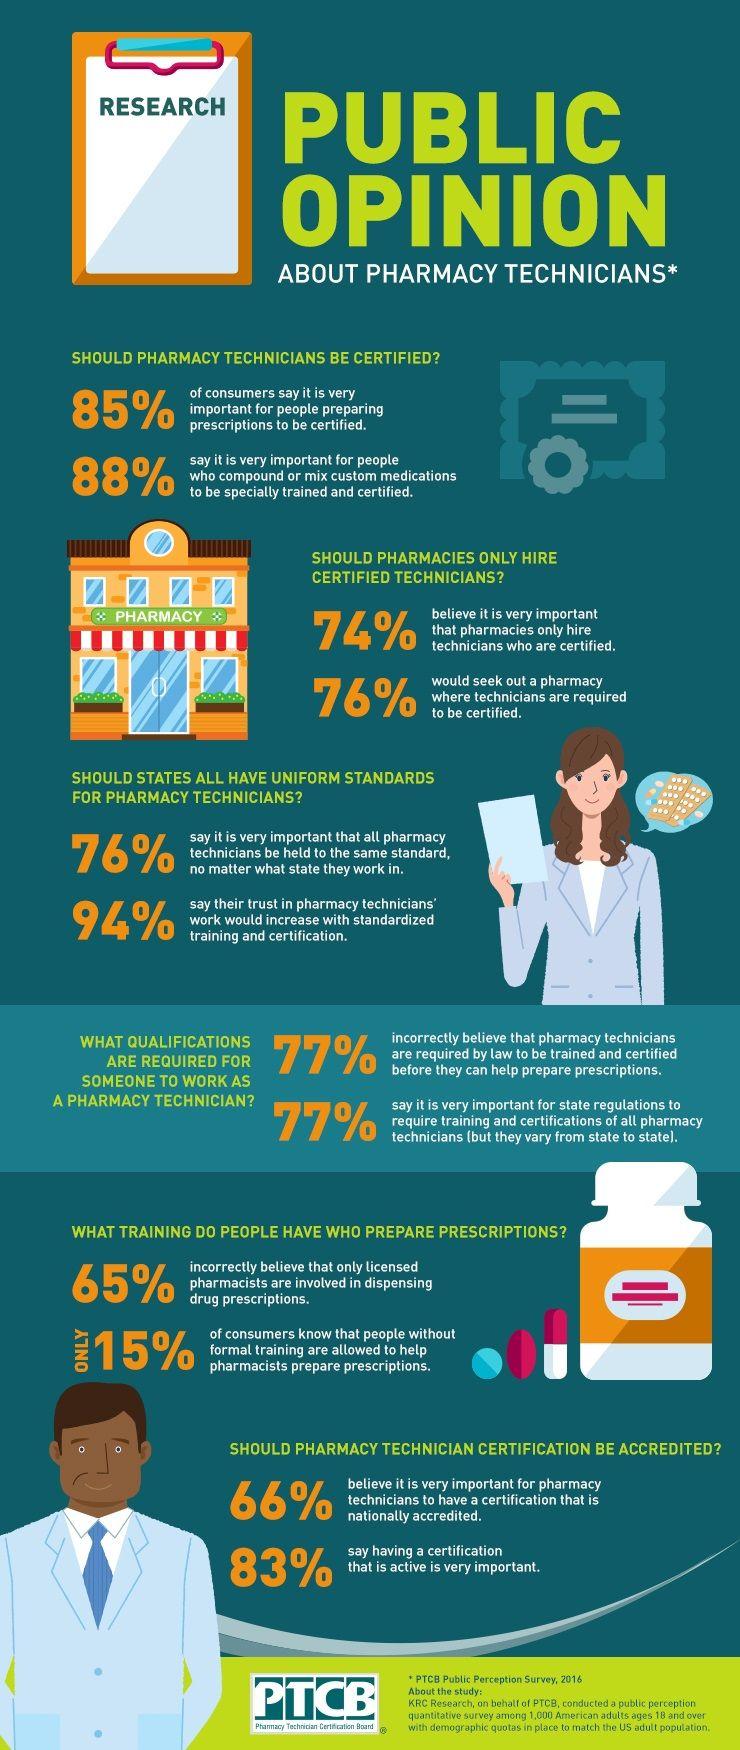 PTCBPublicOpinionInfographic (2) World pharmacist day